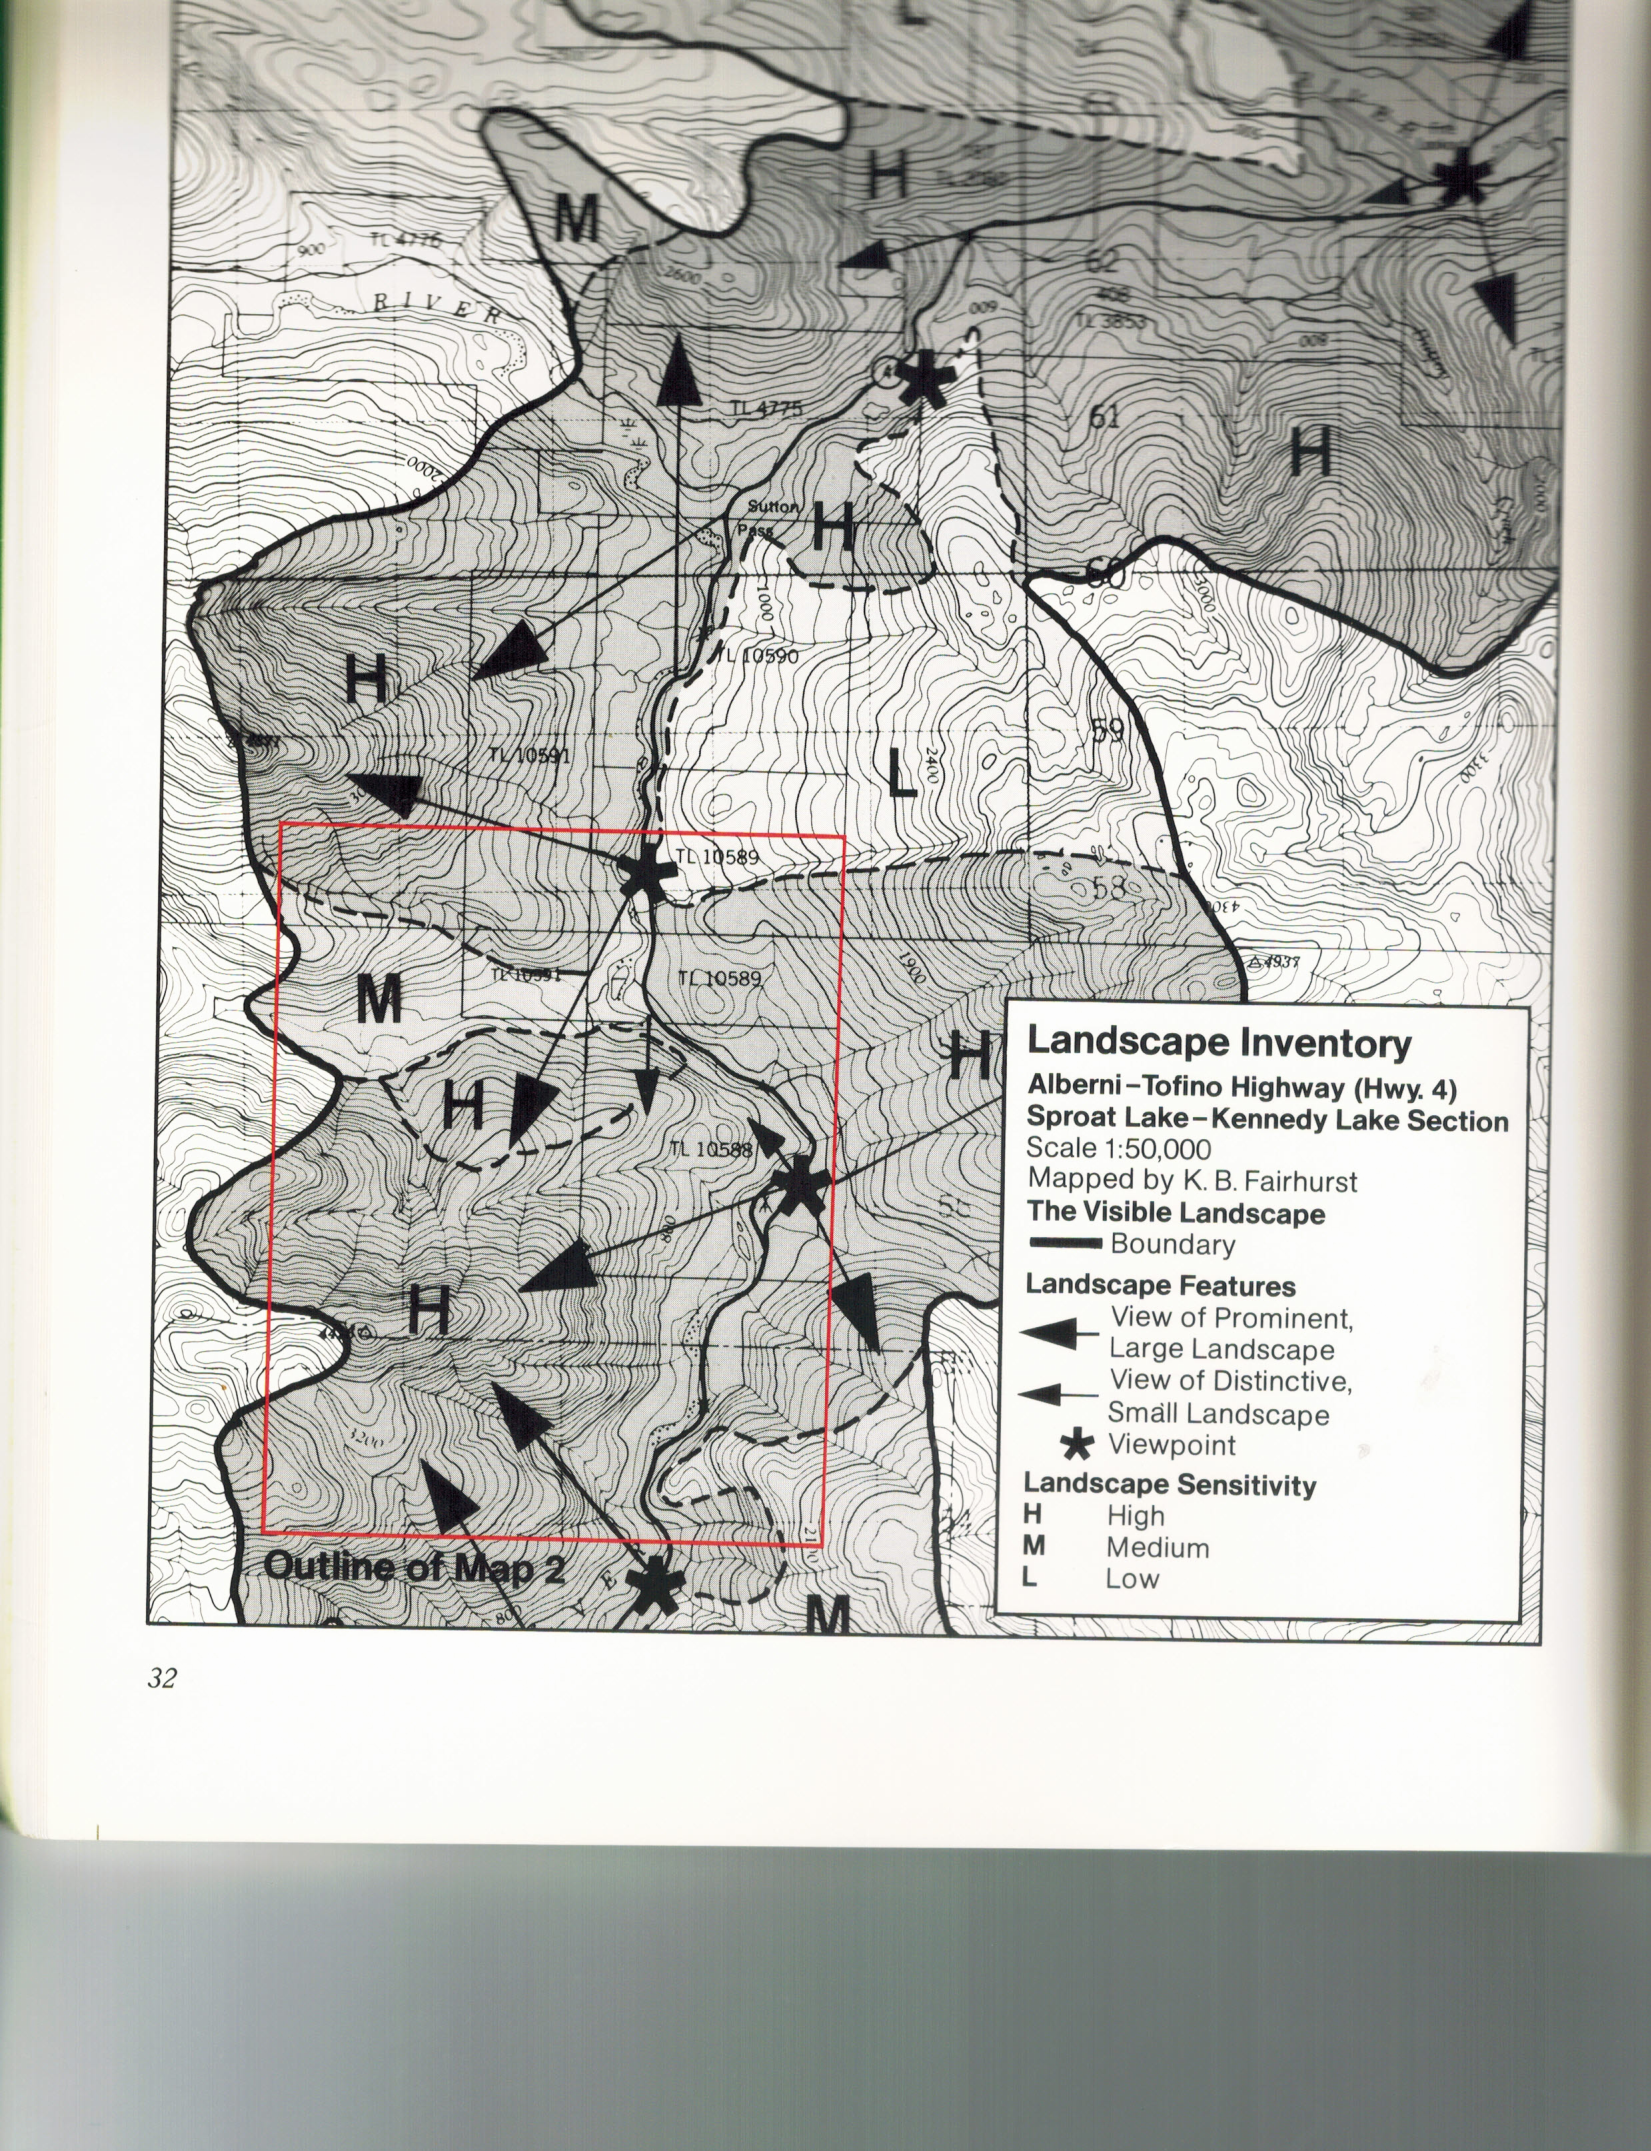 Original Alberni-Tofino Visual Landscape Inventory mapped by KB Fairhurst 1980